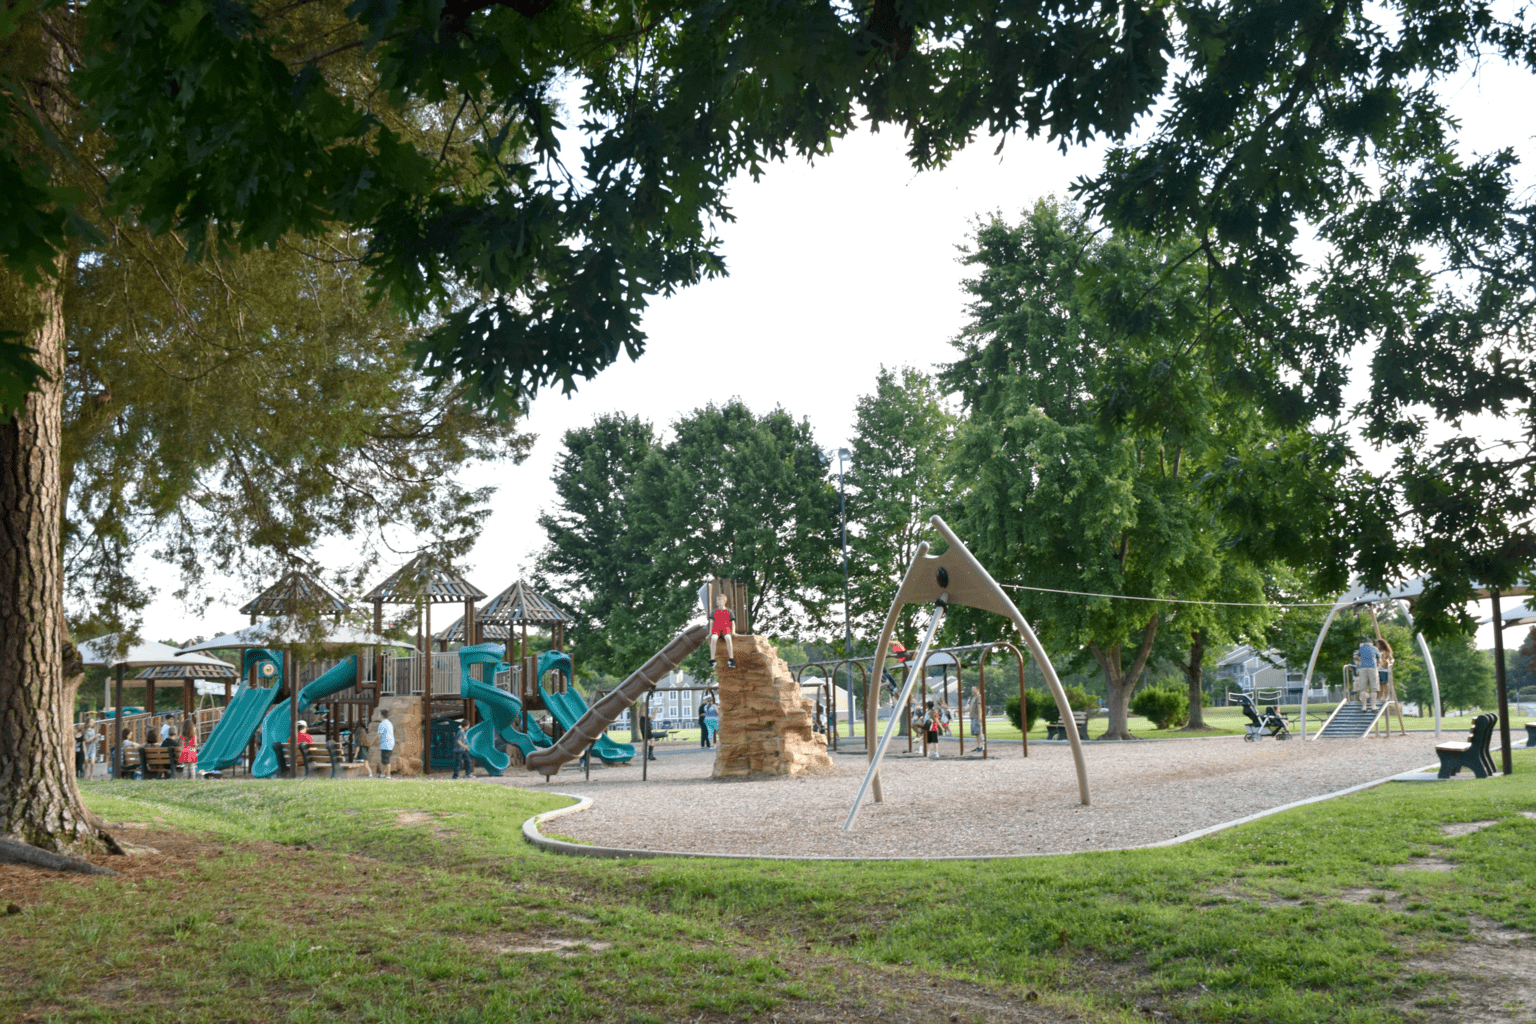 Family Field Trip to Williamsburg, VA - Veteran's Park